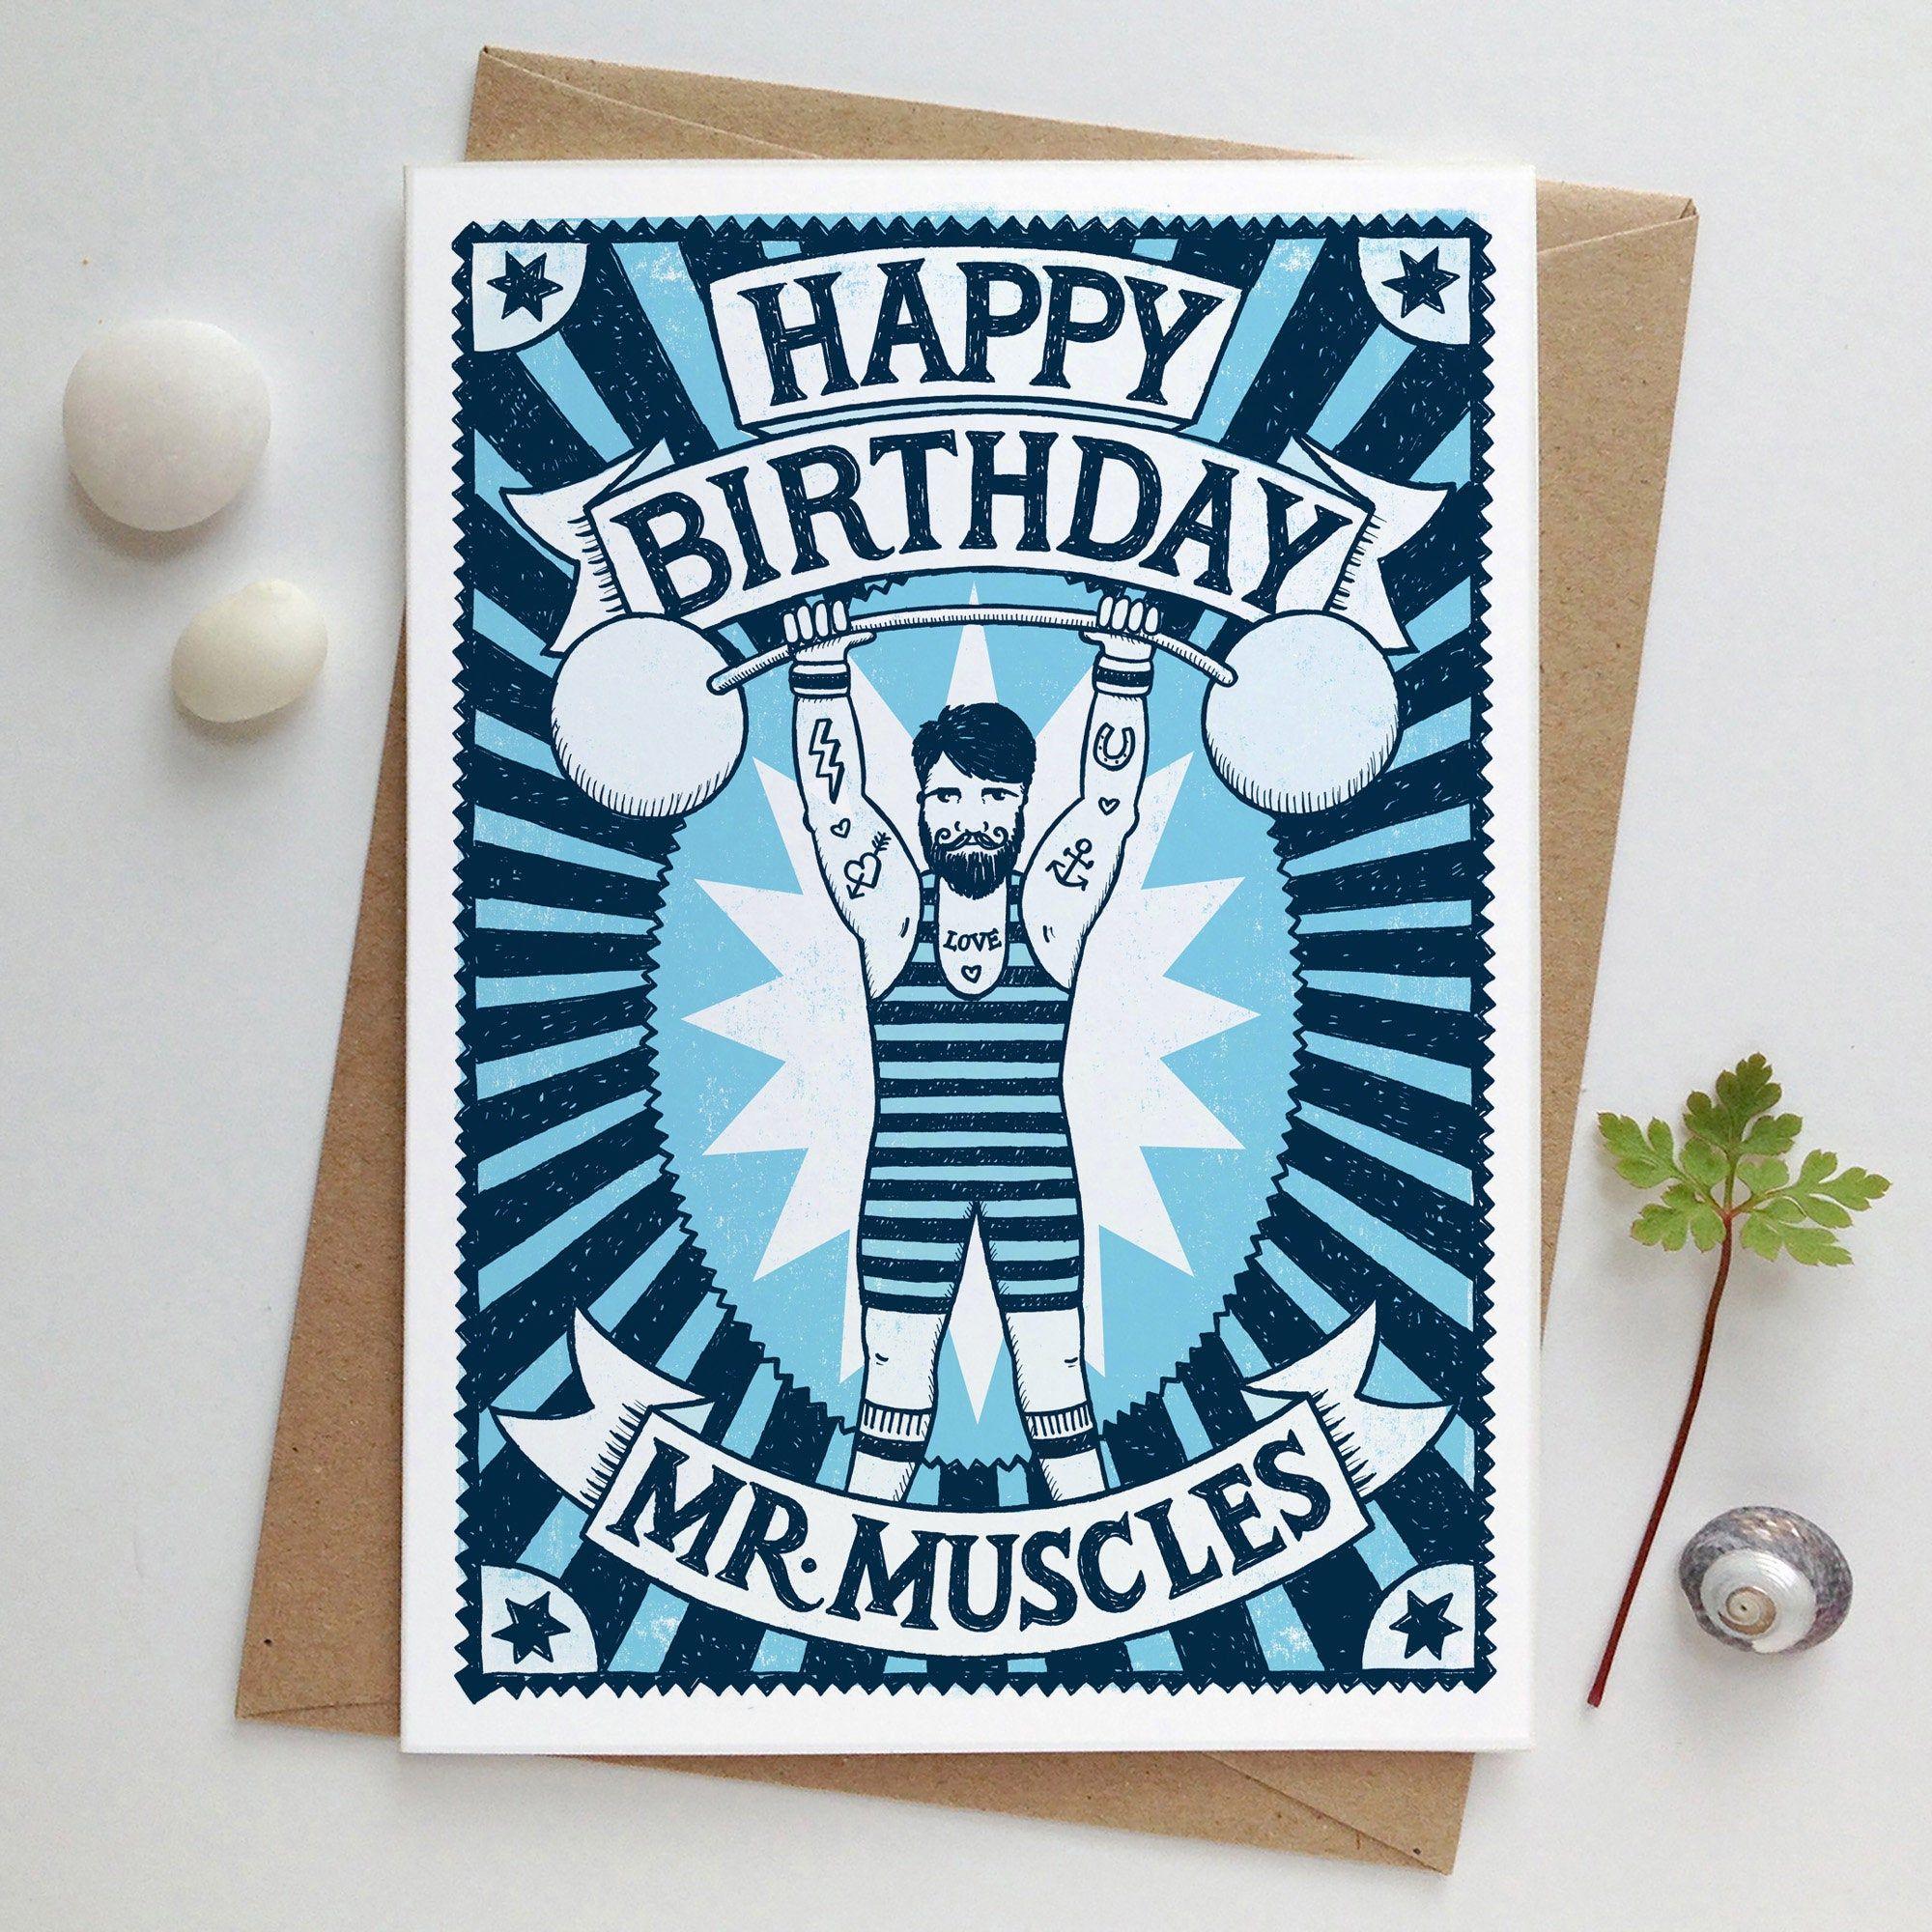 Muscle Man Birthday Card Etsy Birthday Cards For Men Birthday Cards Cards For Boyfriend